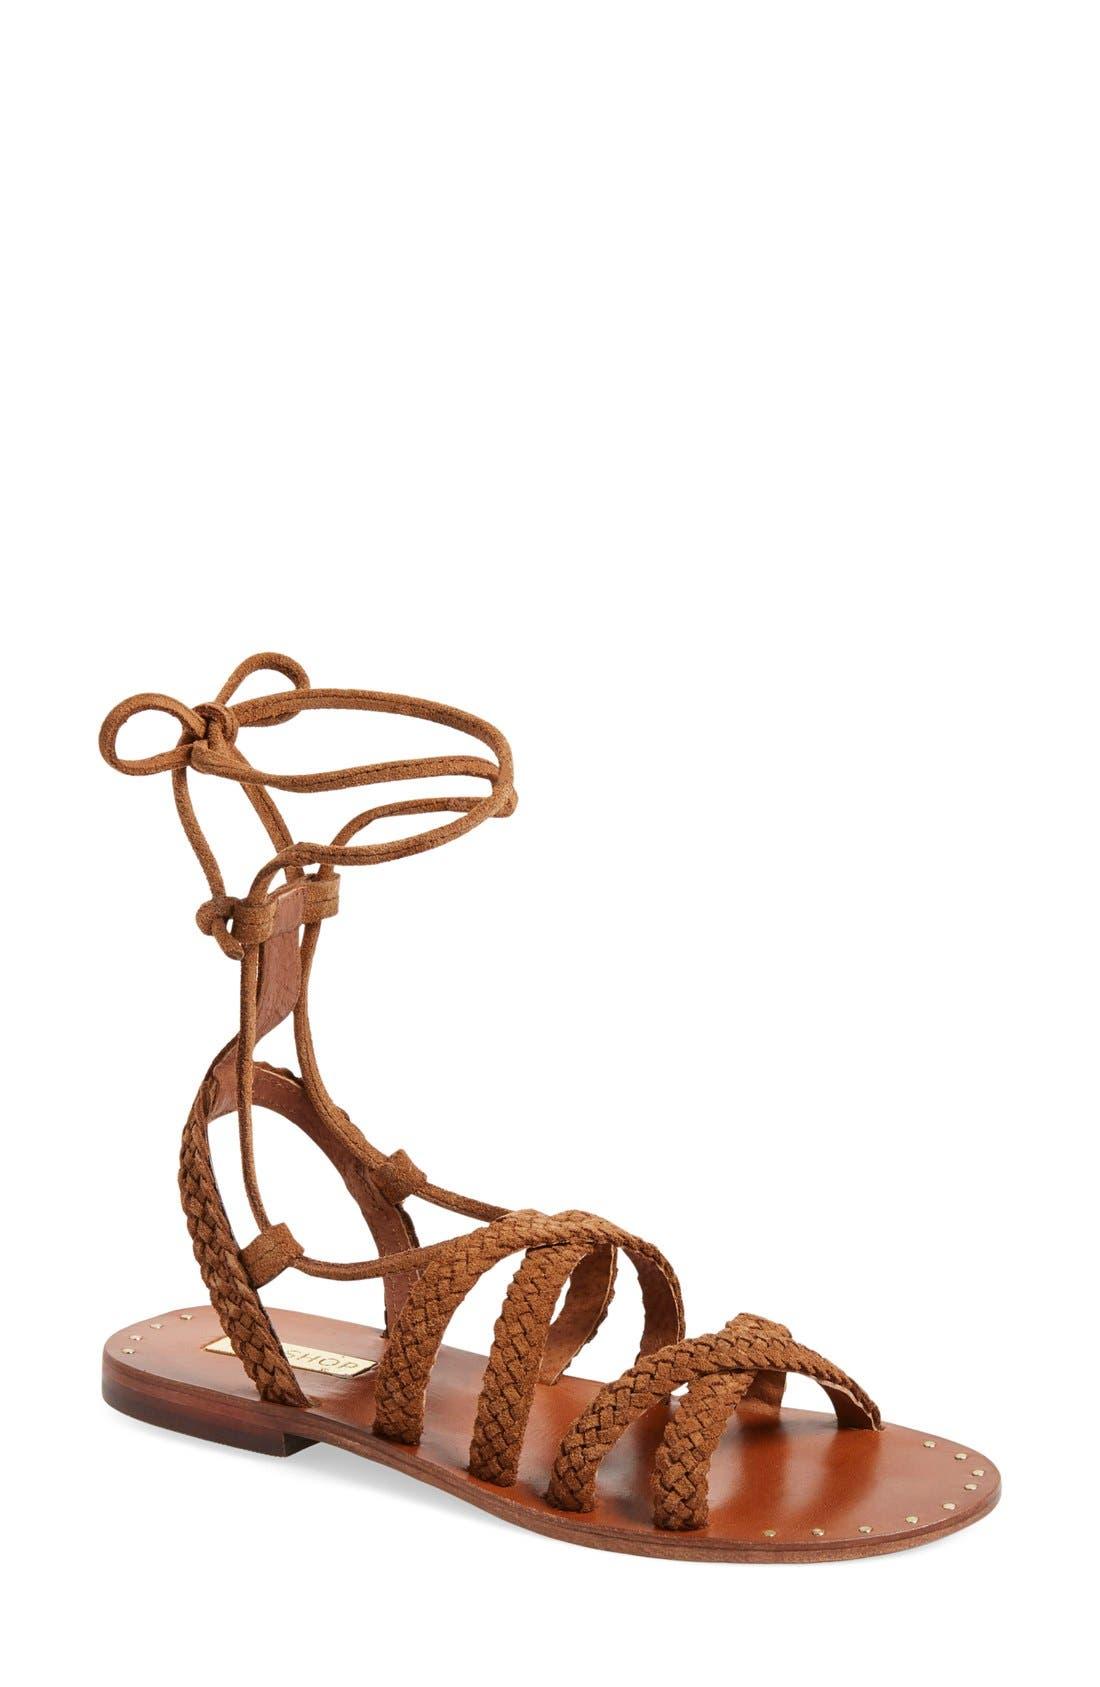 Alternate Image 1 Selected - Topshop 'Farewell' Gladiator Sandals (Women)